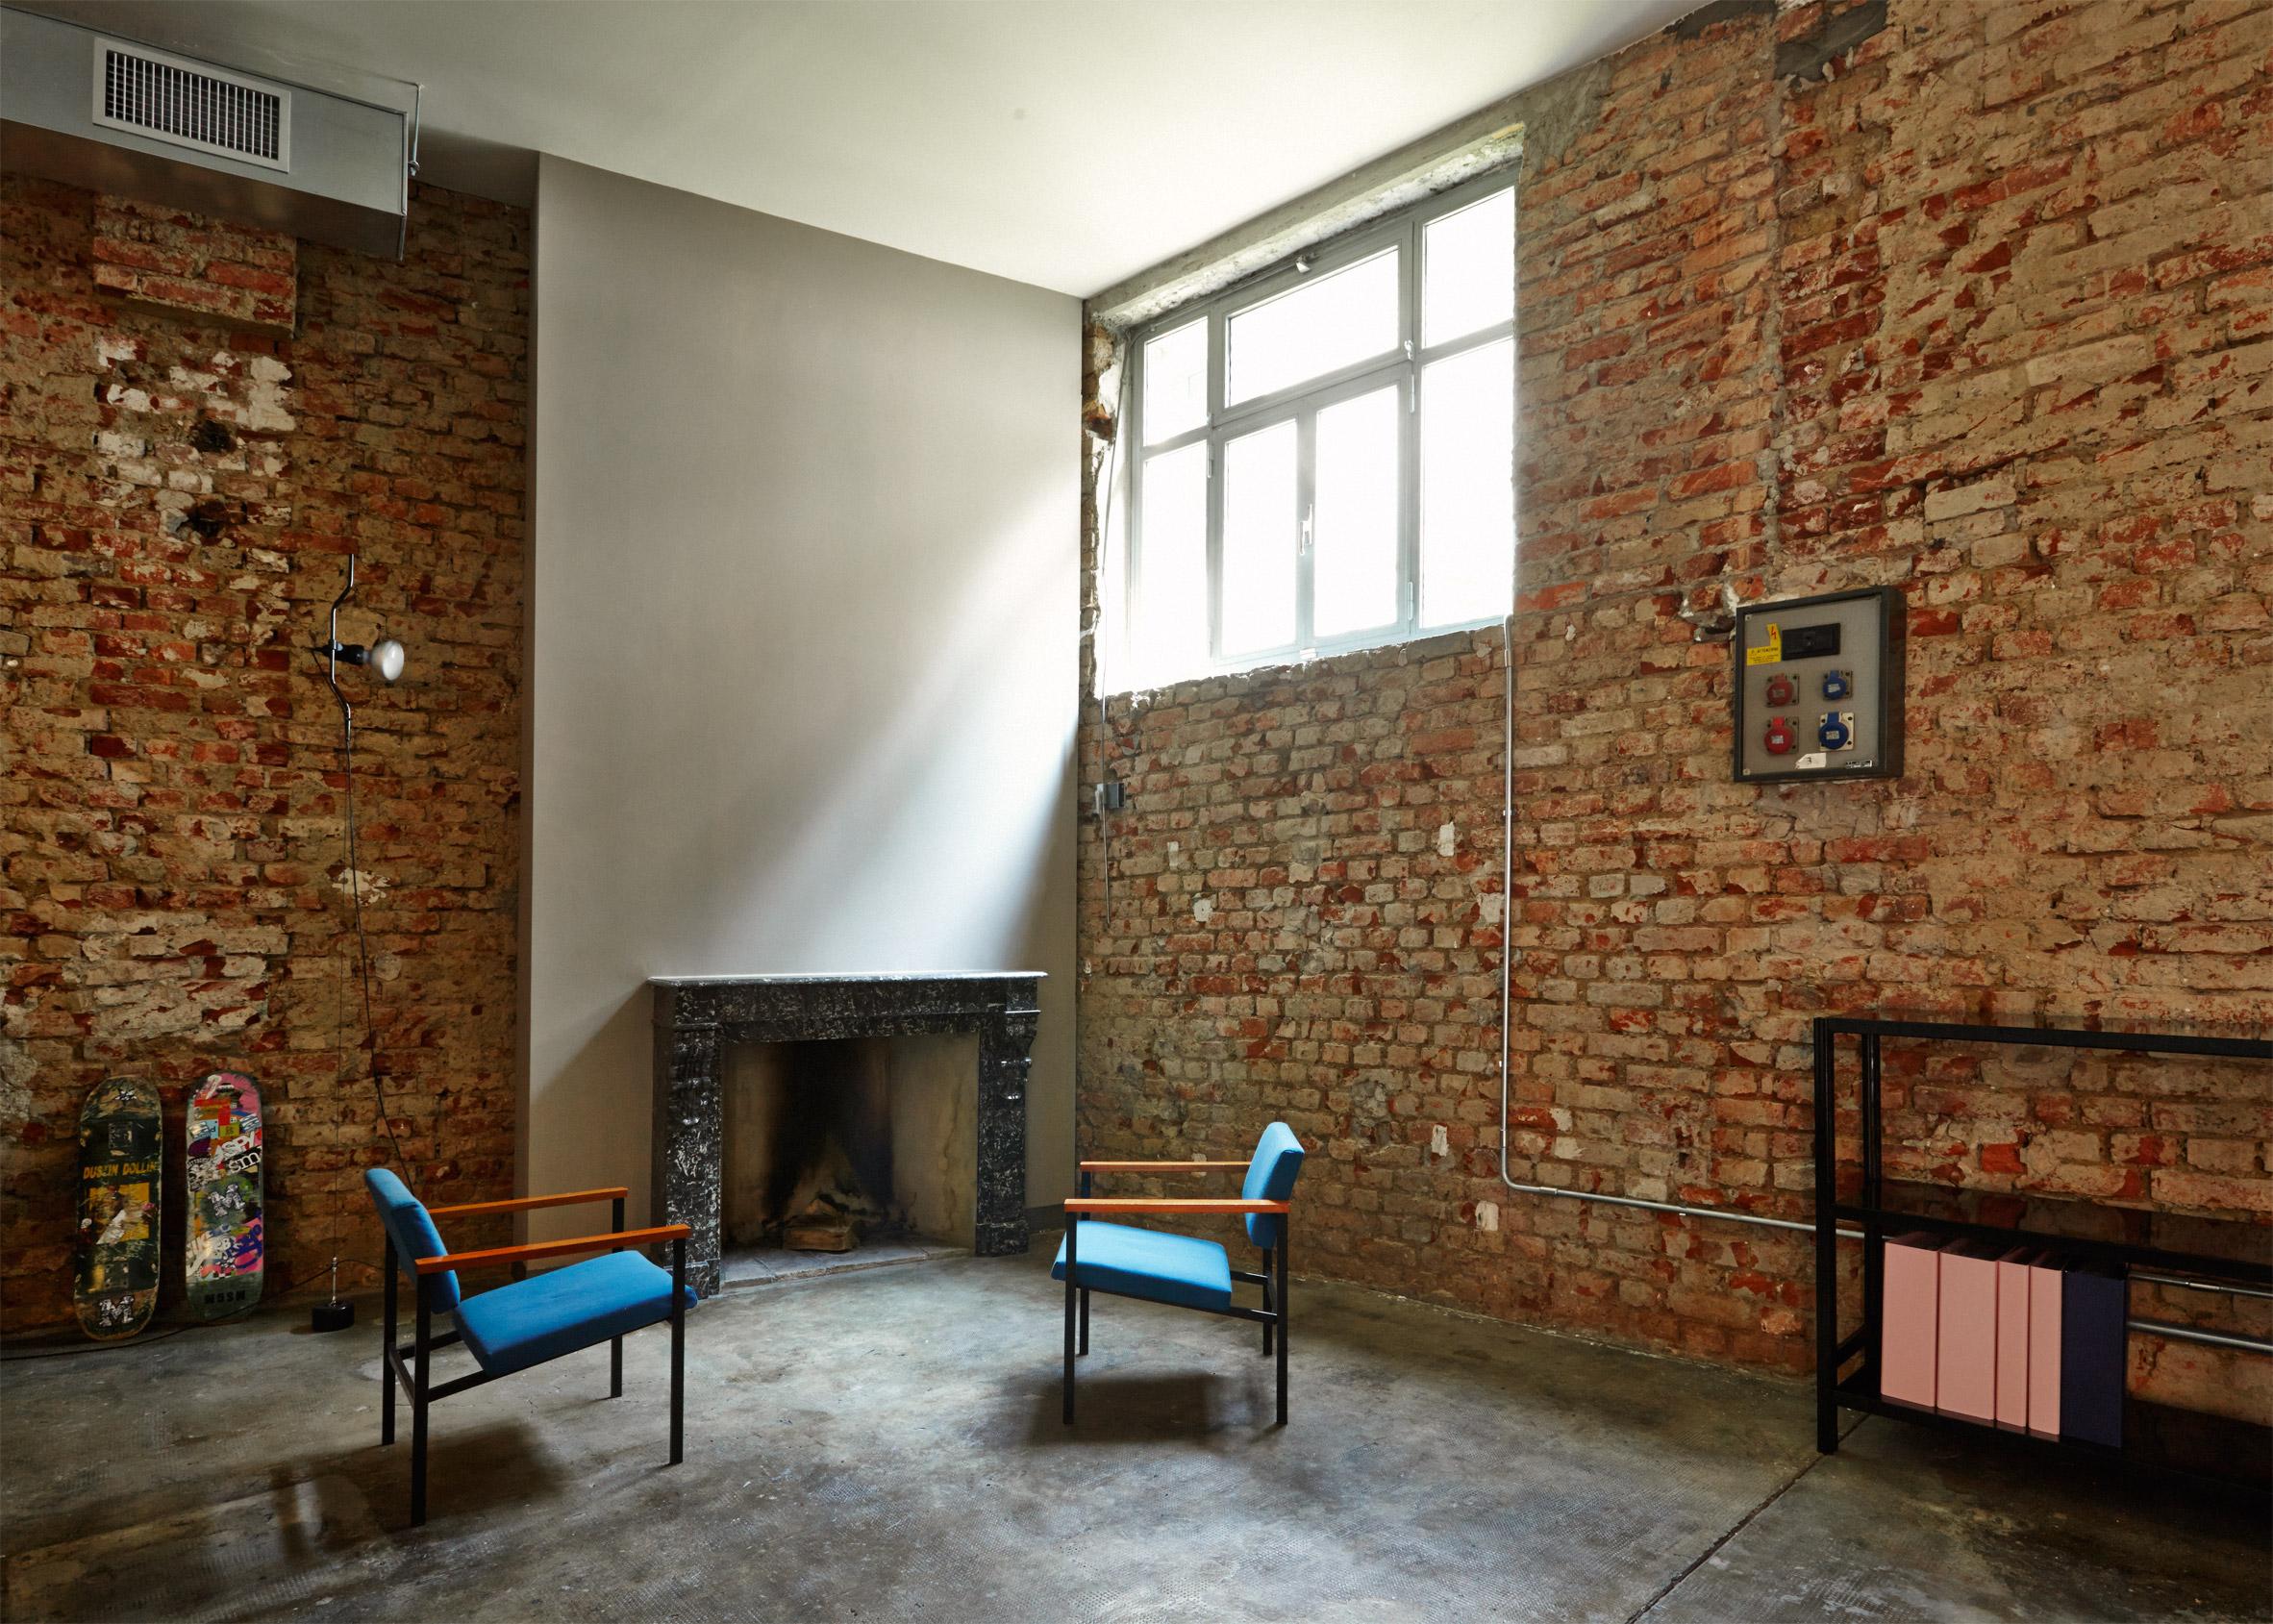 MSGM Headquarters by Fabio Ferillo on the top 10 brick interiors on Dezeen's Pinterest boards